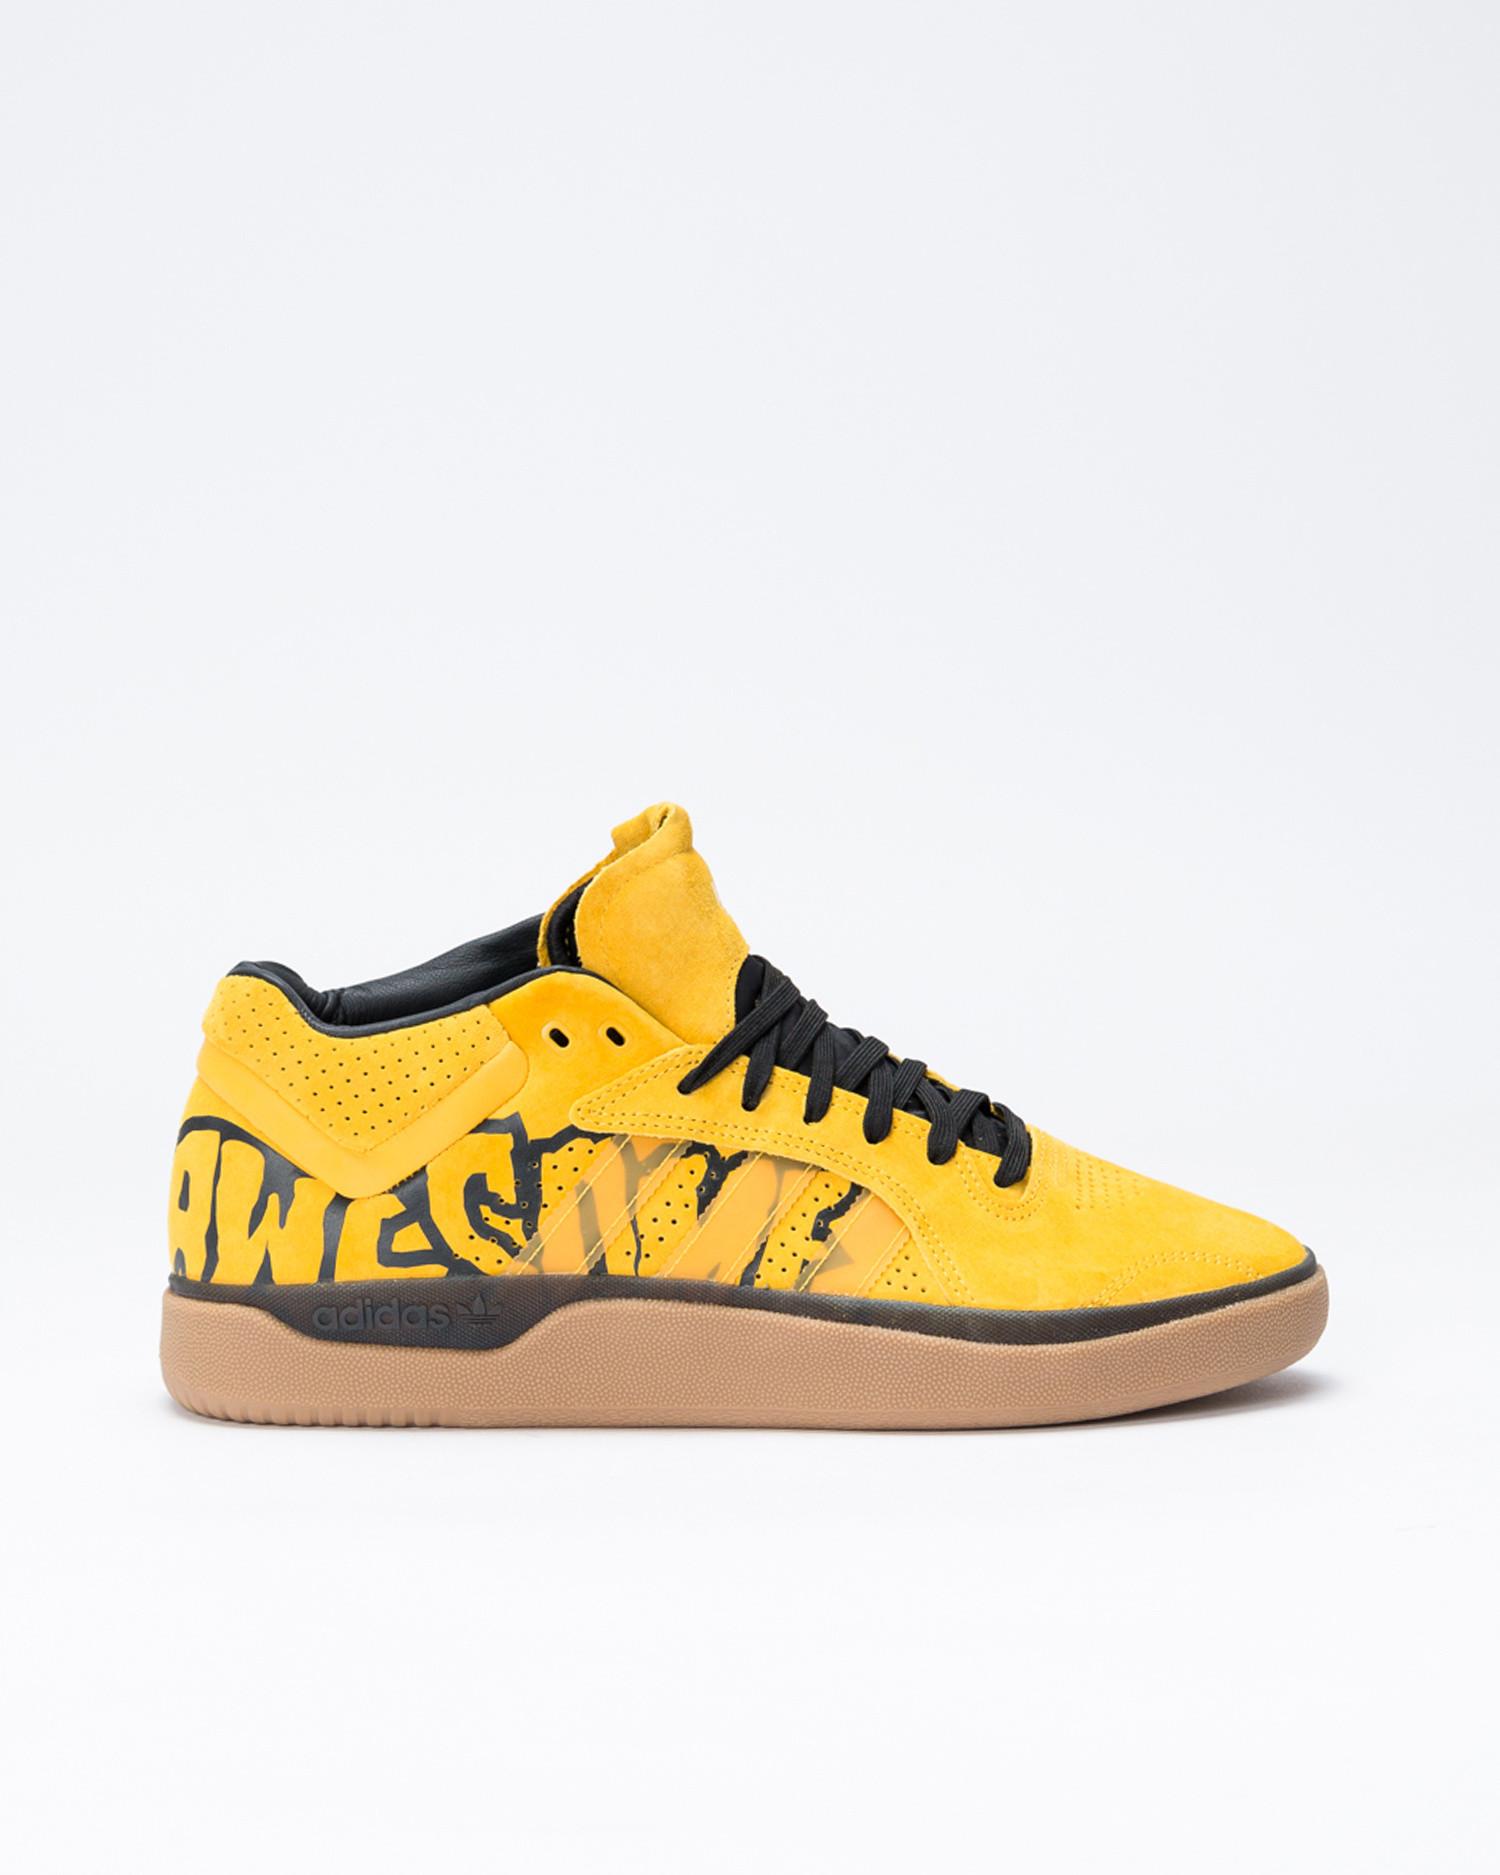 adidas Skateboarding x Fucking Awesome Tyshawn Active Gold/Core Black/Gum